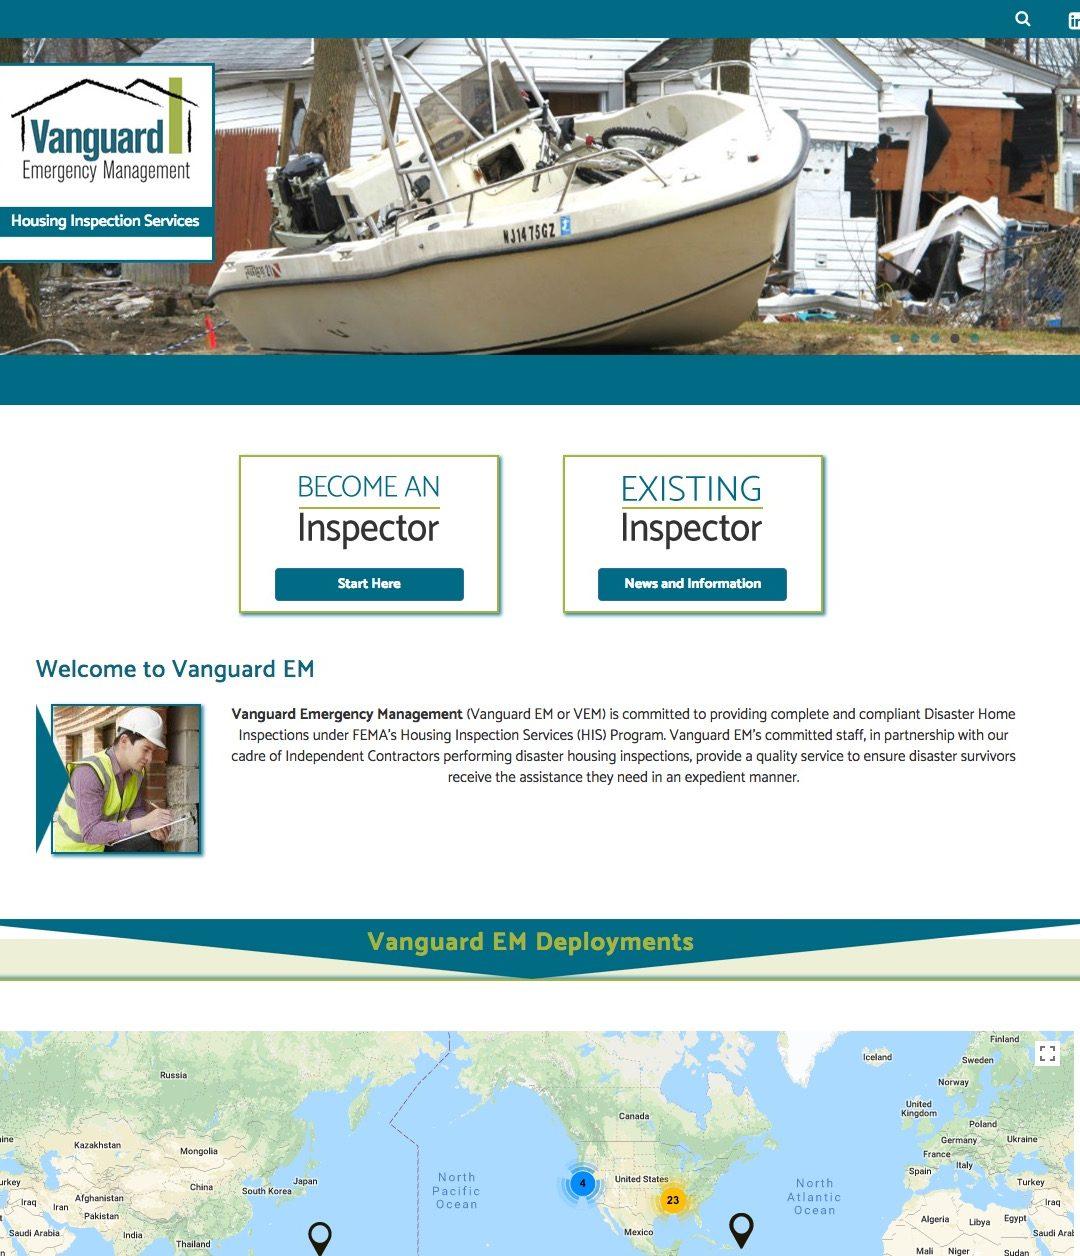 Vanguard Emergency Management